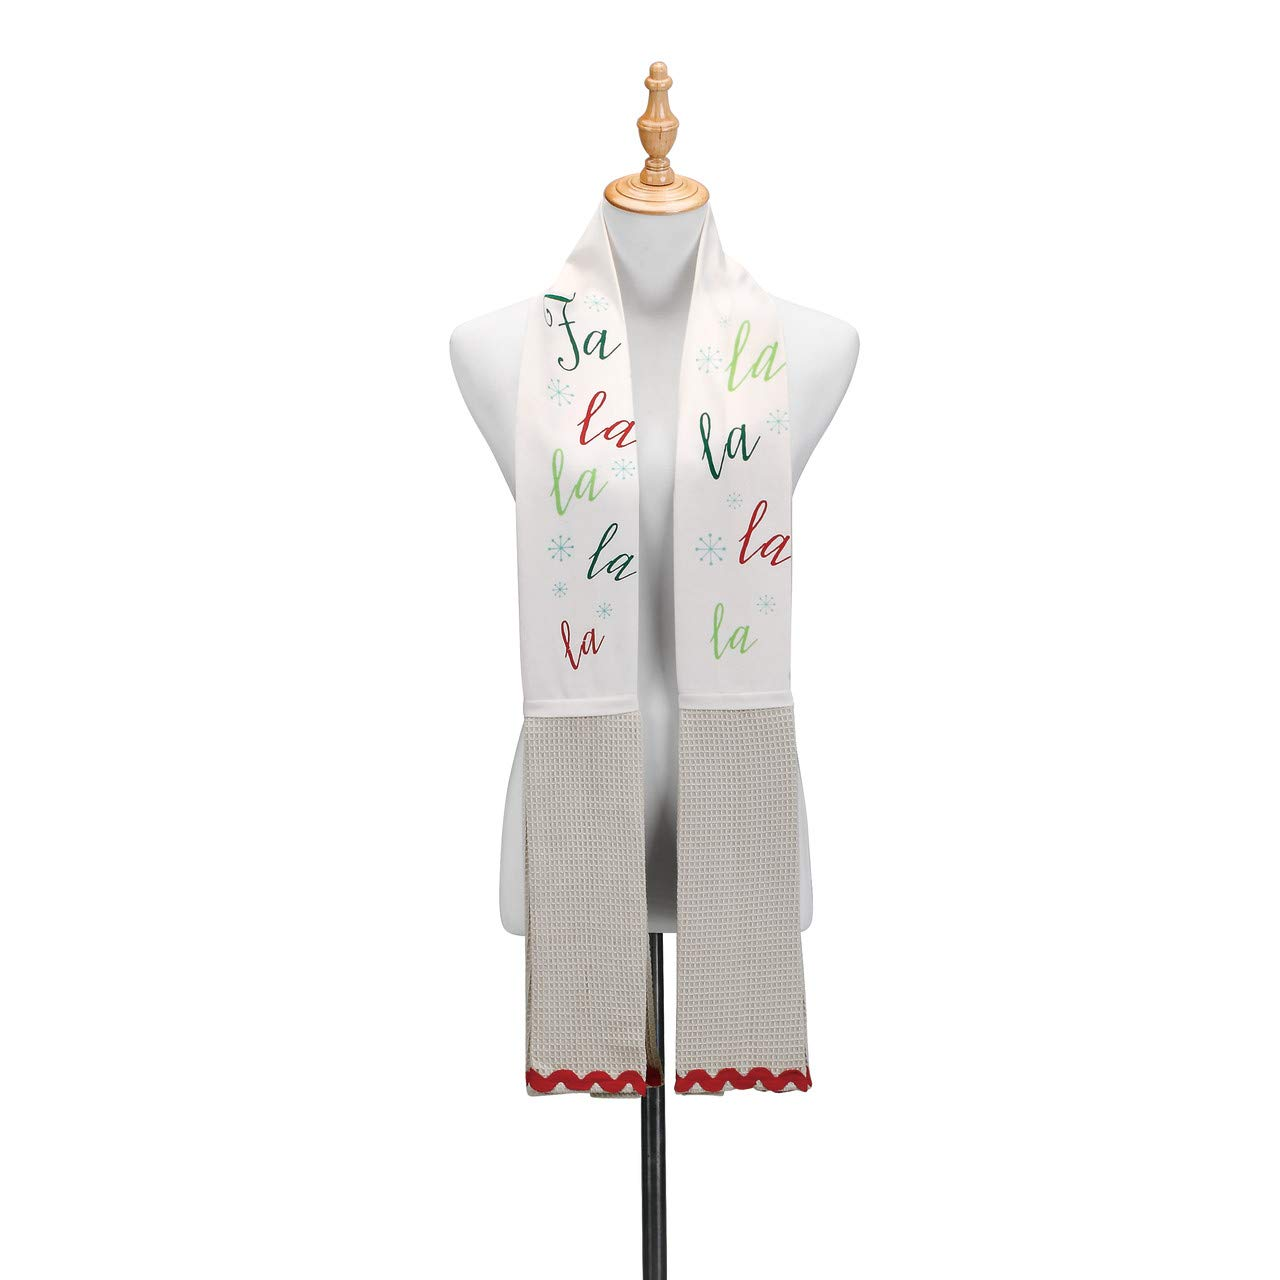 Warm Winter Wishes Cream Color 68 inch Cotton Fabric Christmas Towel Boa